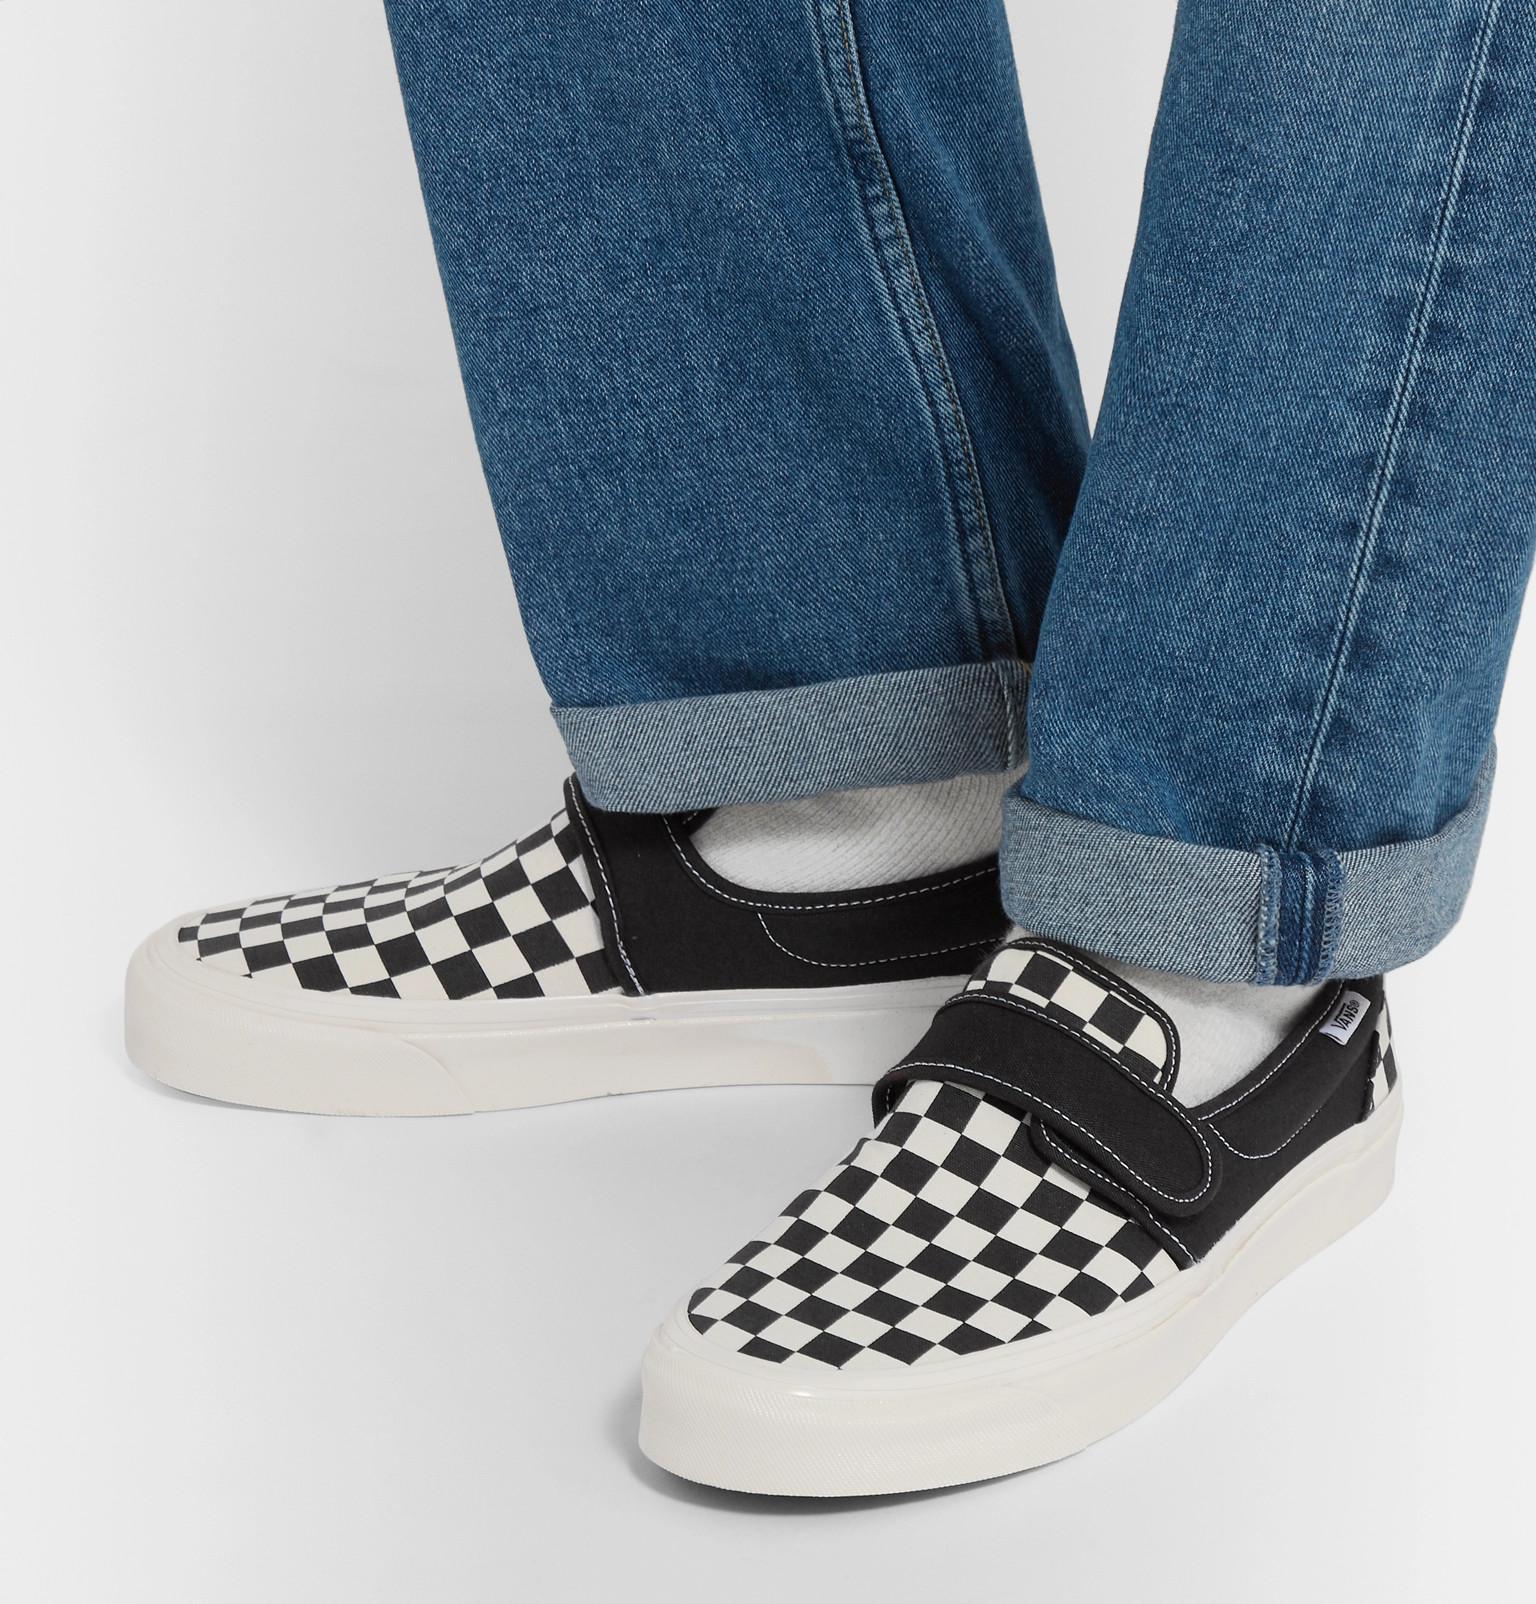 82aef50faf8 Vans Slip-on 47 V Dx Anaheim Factory Pack Sneakers in Black for Men ...